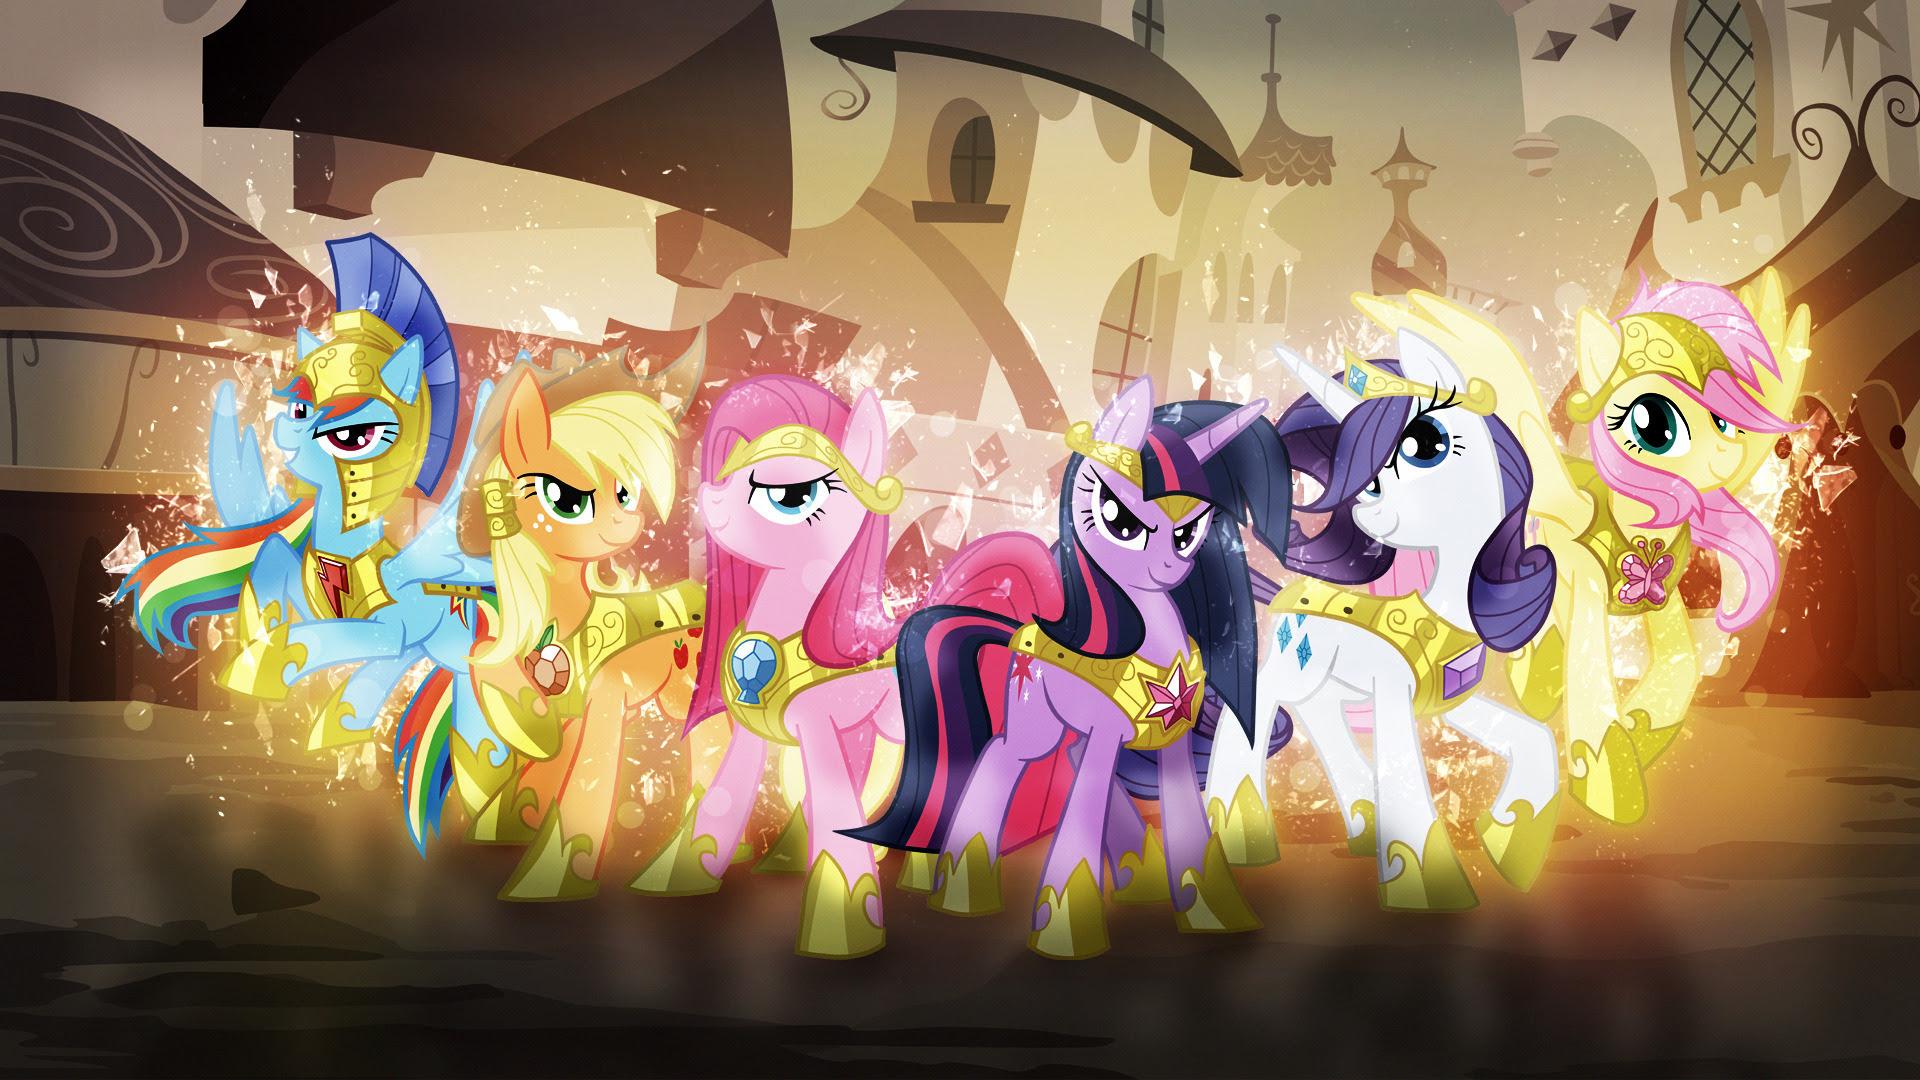 Pony Wallpaper My Little Pony Friendship Is Magic Wallpaper